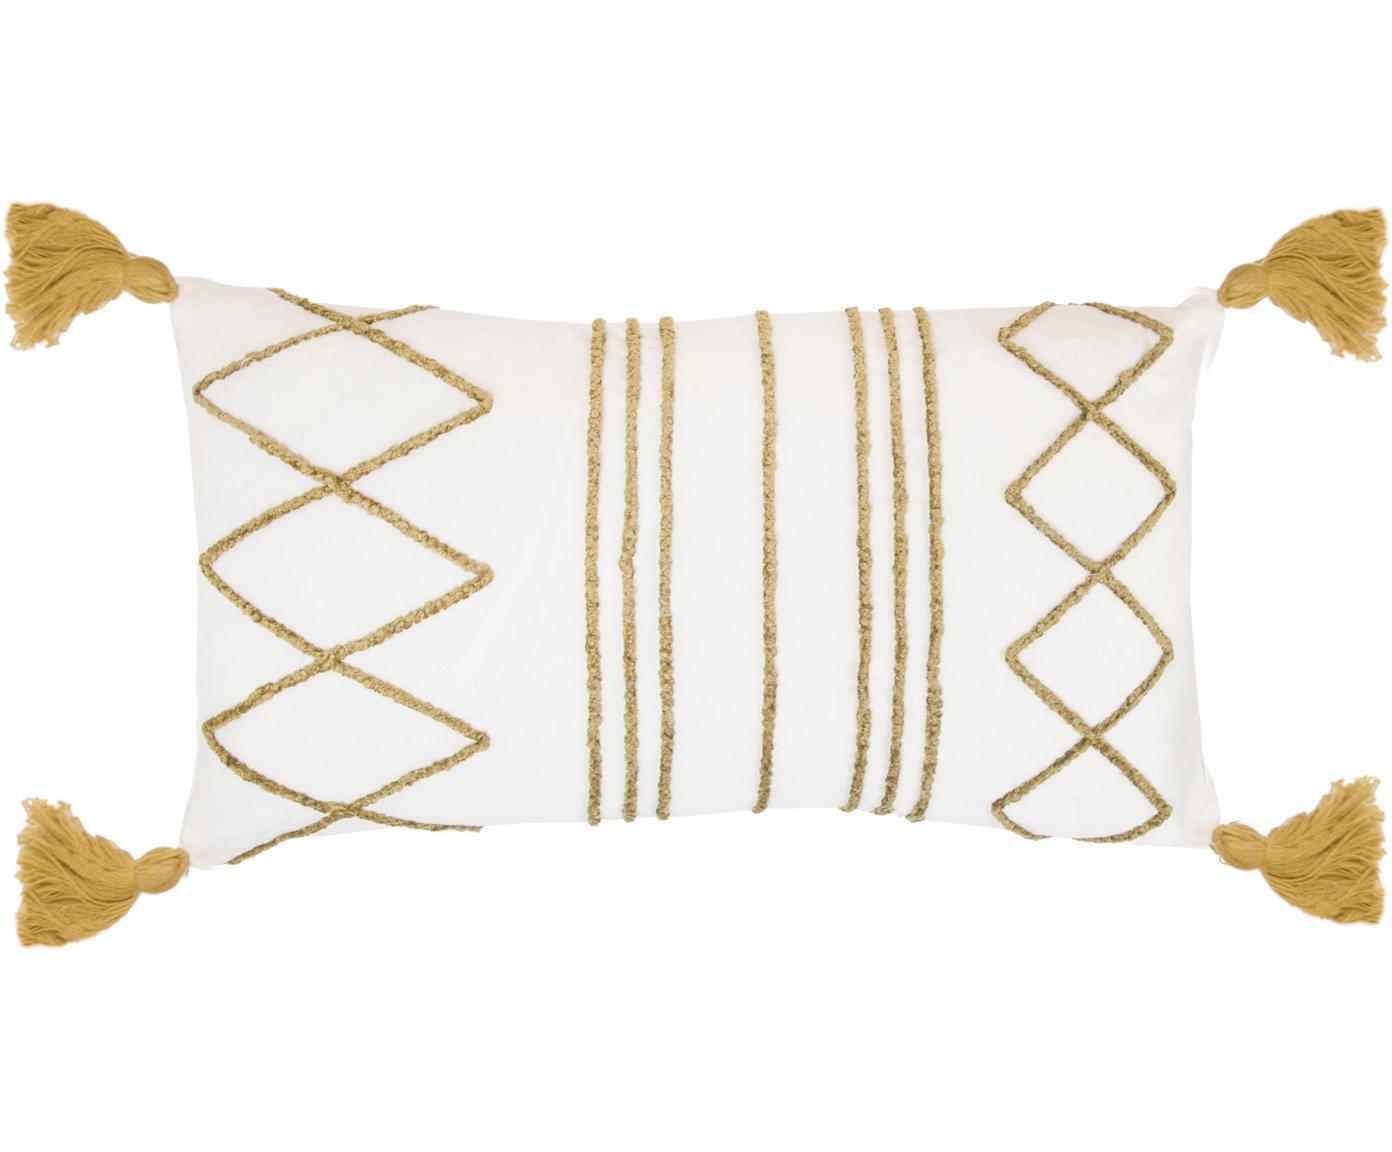 Funda de cojín texturizado con borlas Istanbul, Algodón, Blanco, amarillo, An 30 x L 50 cm